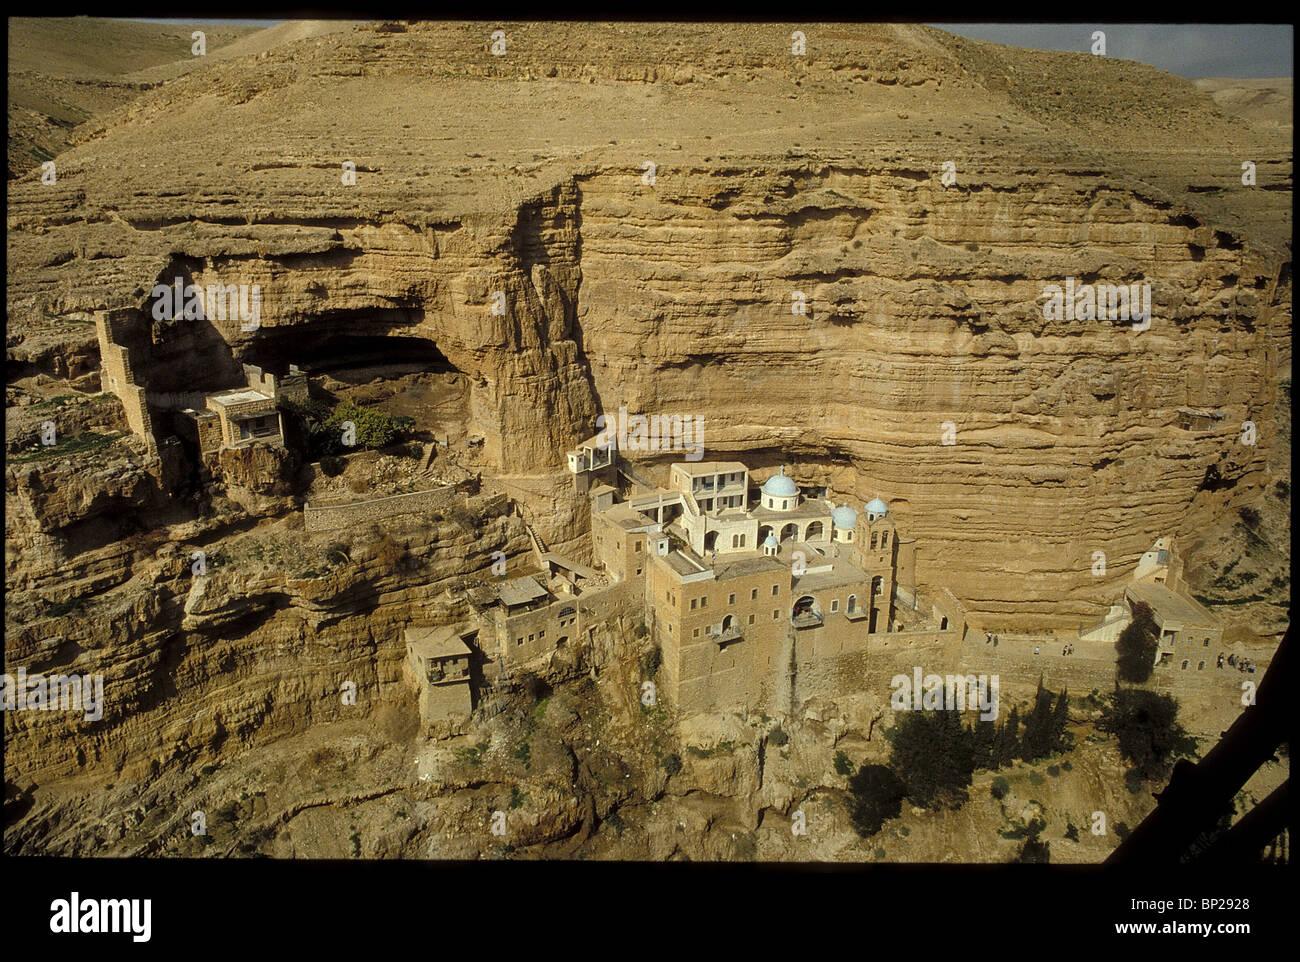 GREEK ORTHODOX MONASTERY OF ST. GEORGE BUILT IN THE 5TH. C. IN WADI KELT IN THE WILDERNESS OF JUDEA BETWEEN JERUSALEM - Stock Image